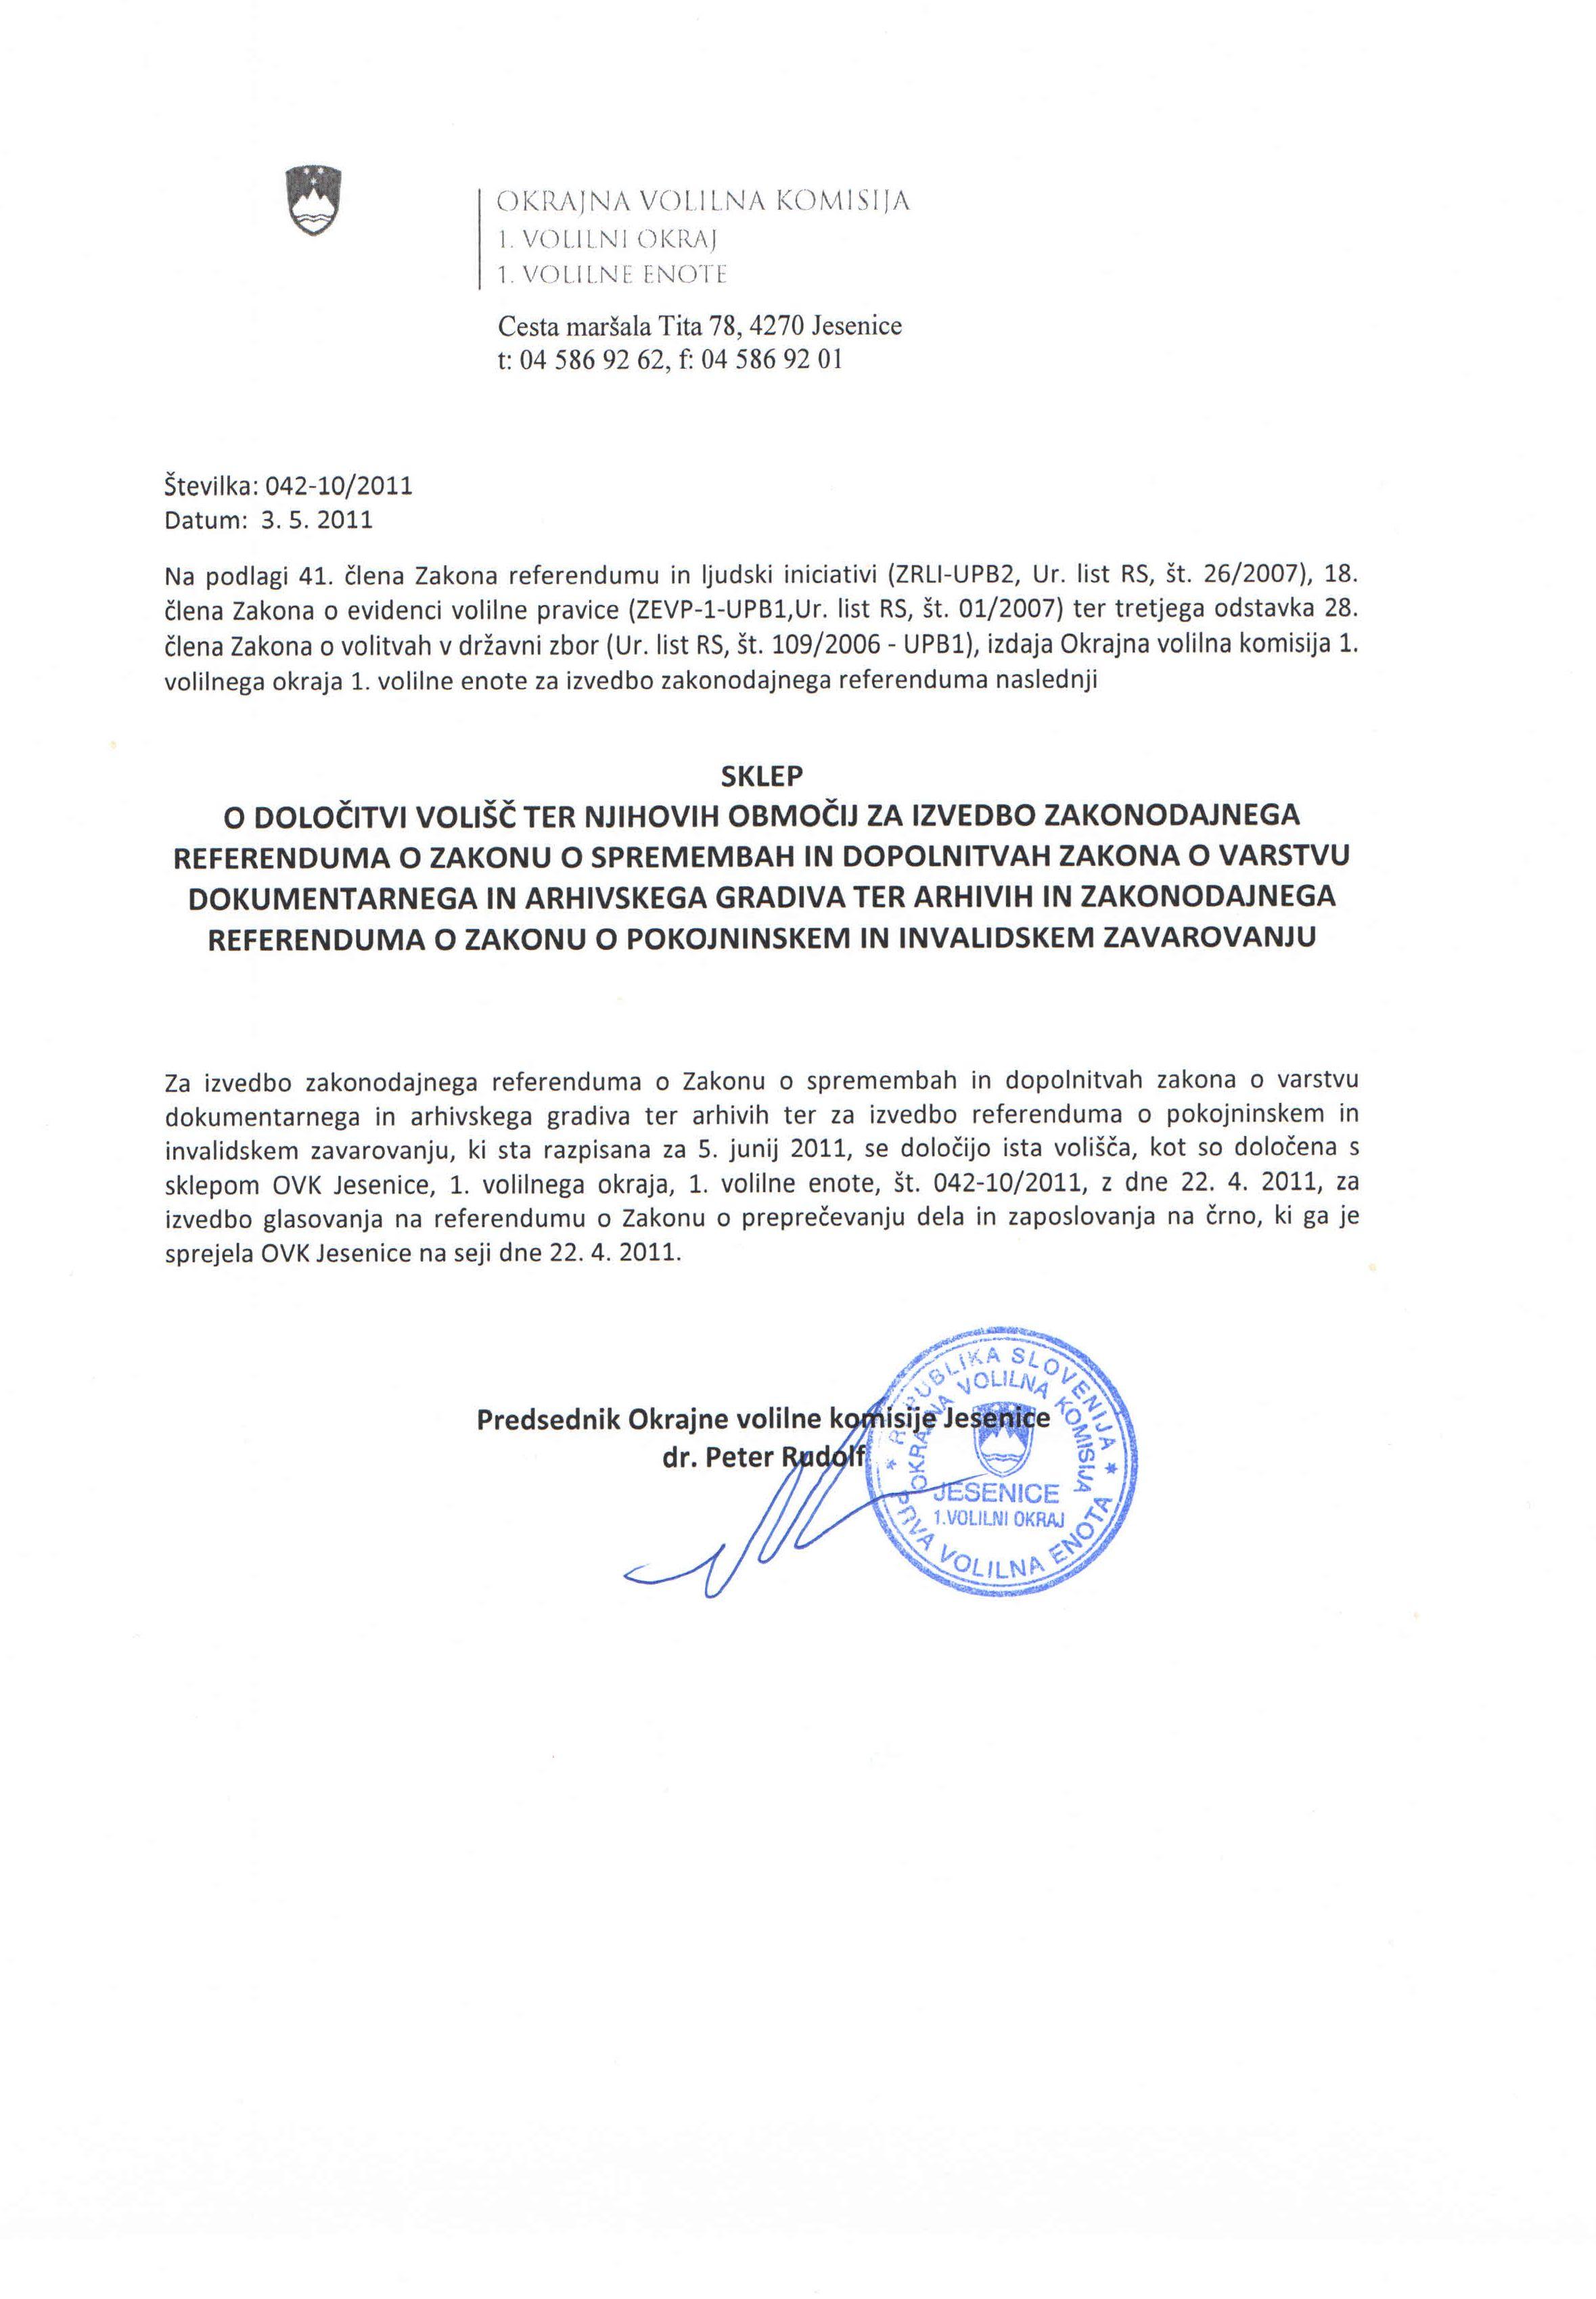 sklep o doloitvi voli -  3 referendumi 2011